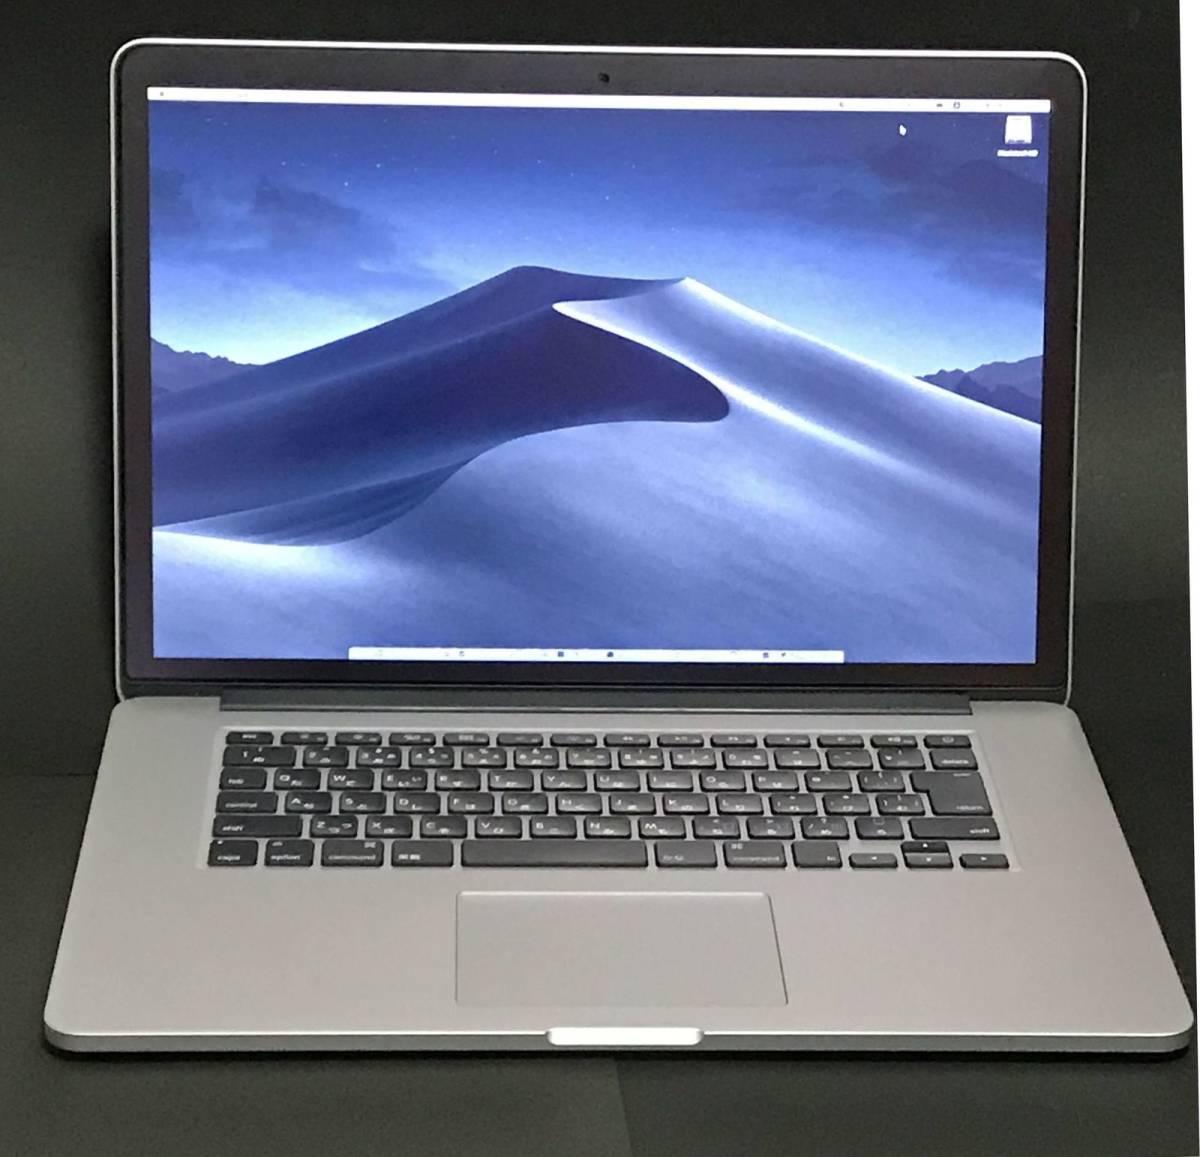 MacBook Pro Retina 15インチ Mid 2015 core i7 2.5GHz 4コア SSD512GB メモリ16GB [送料込]